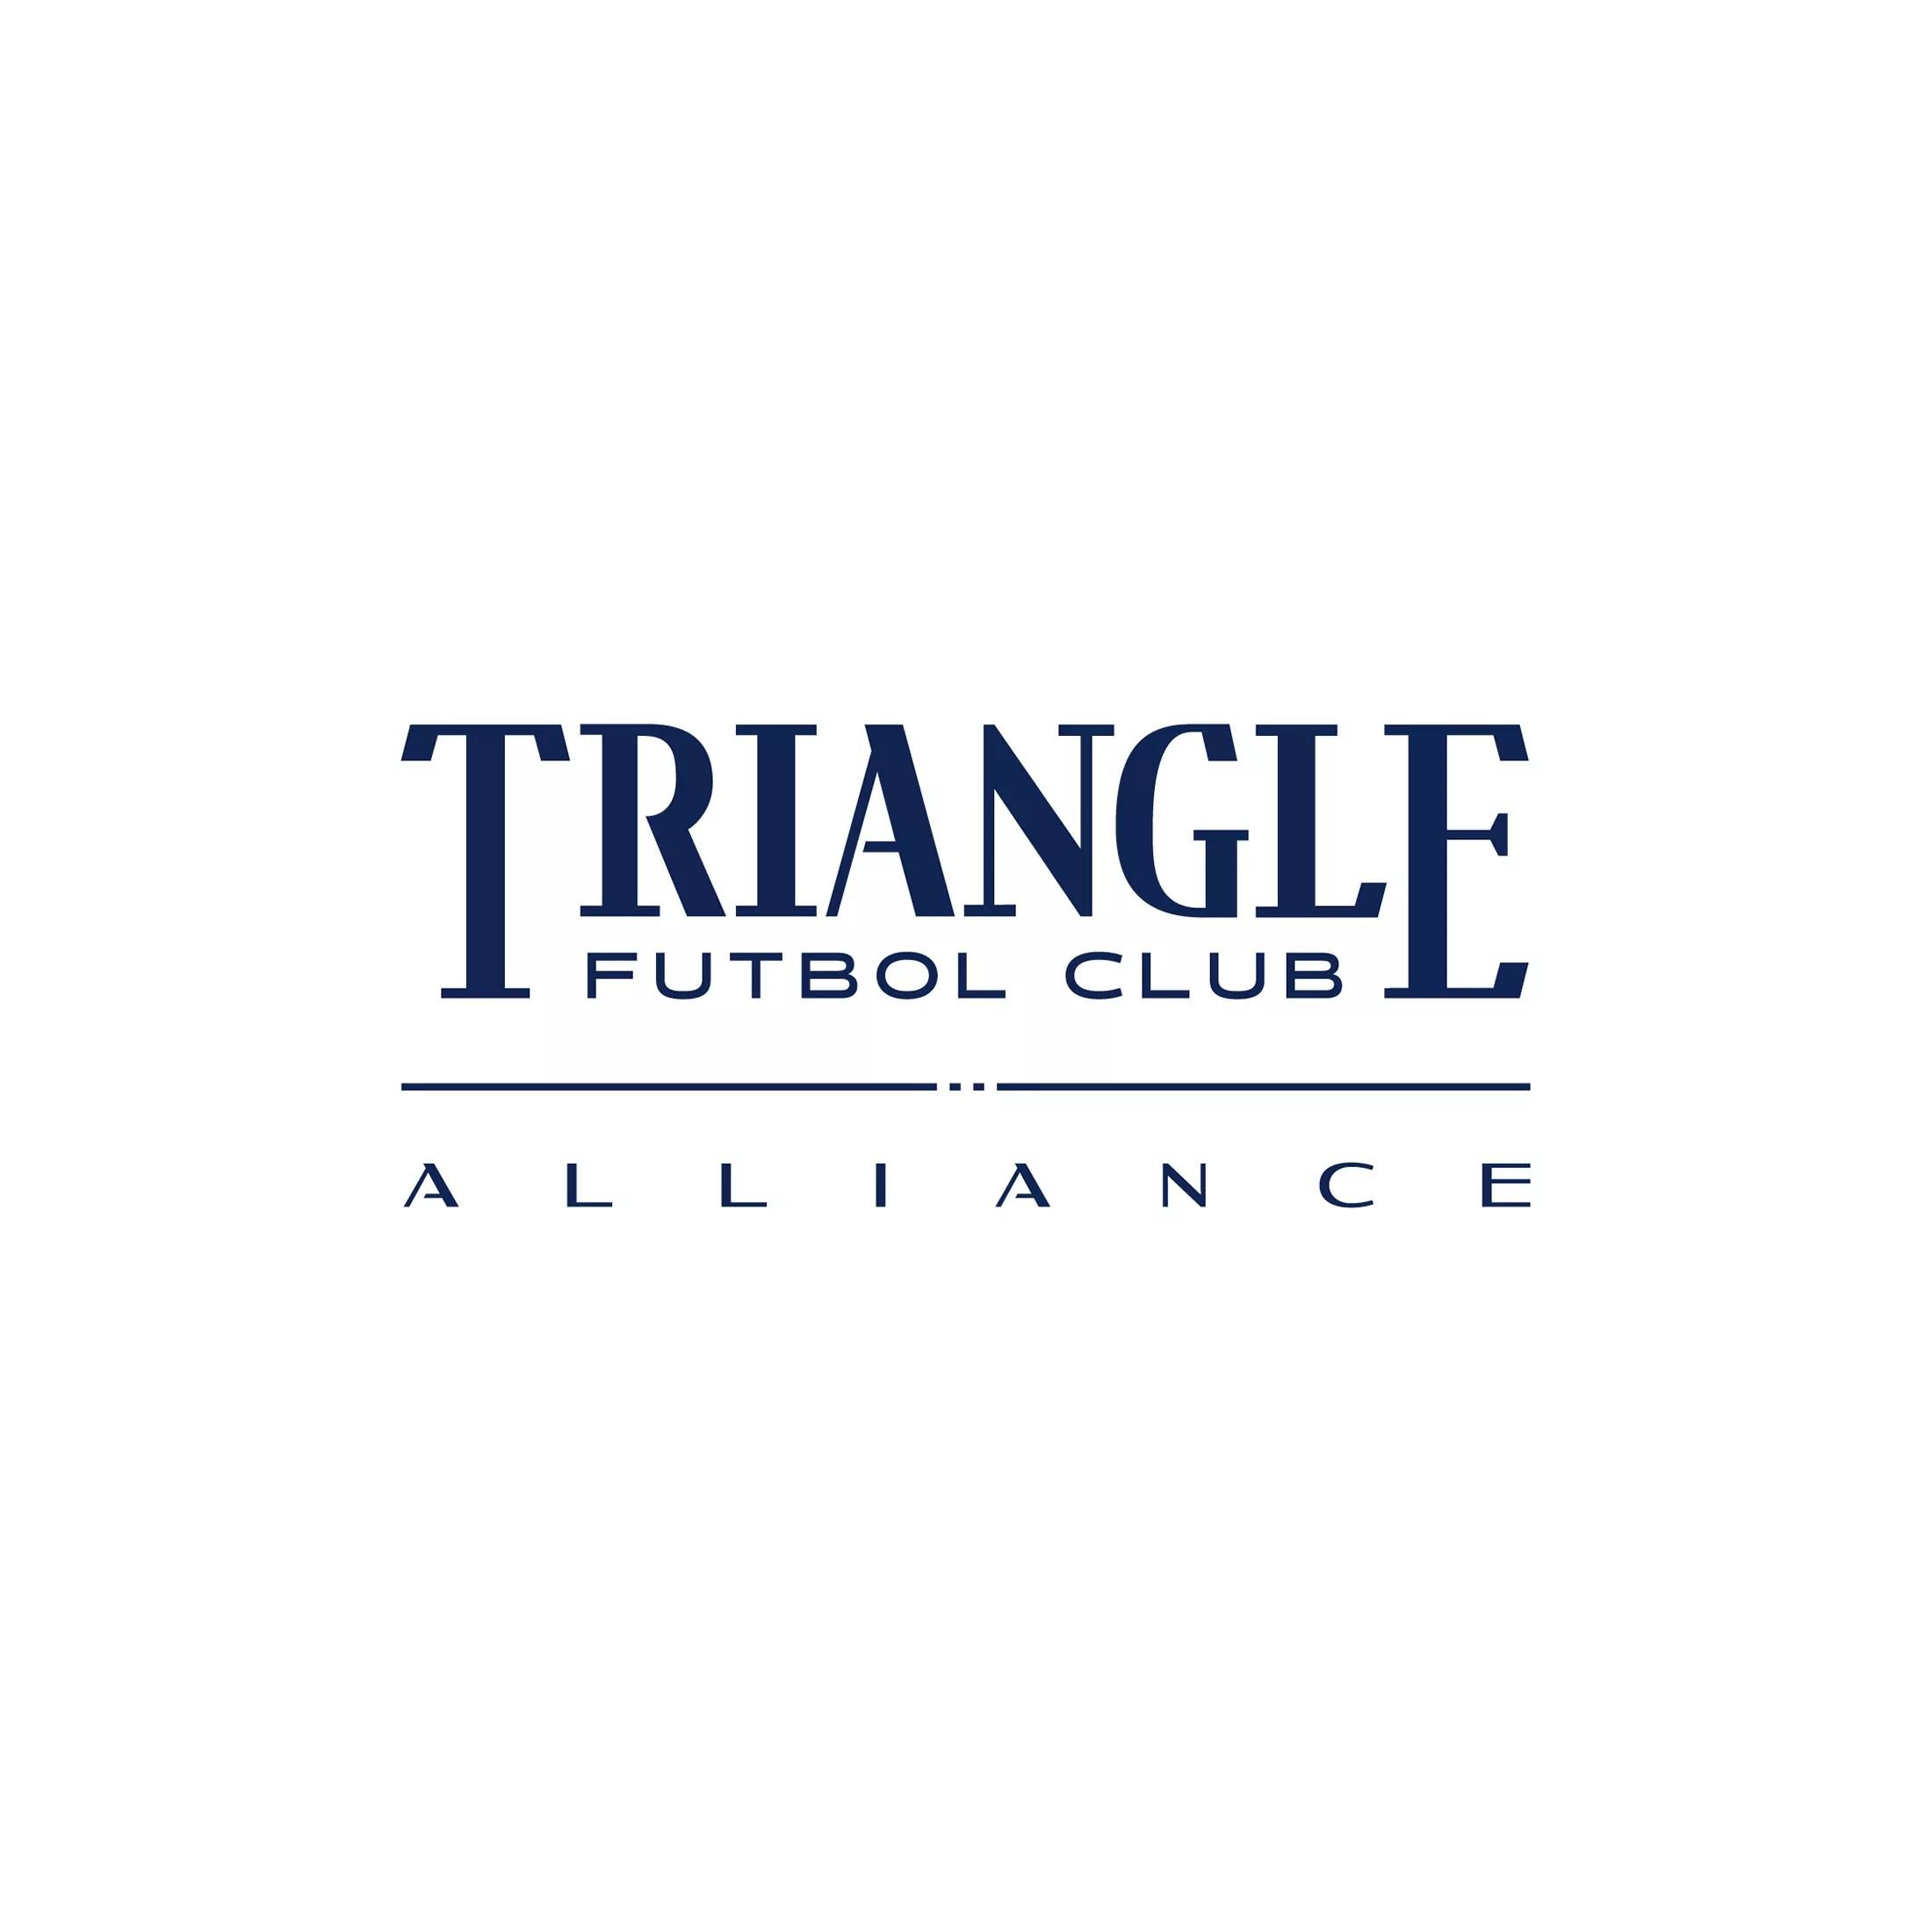 TFCA Branding